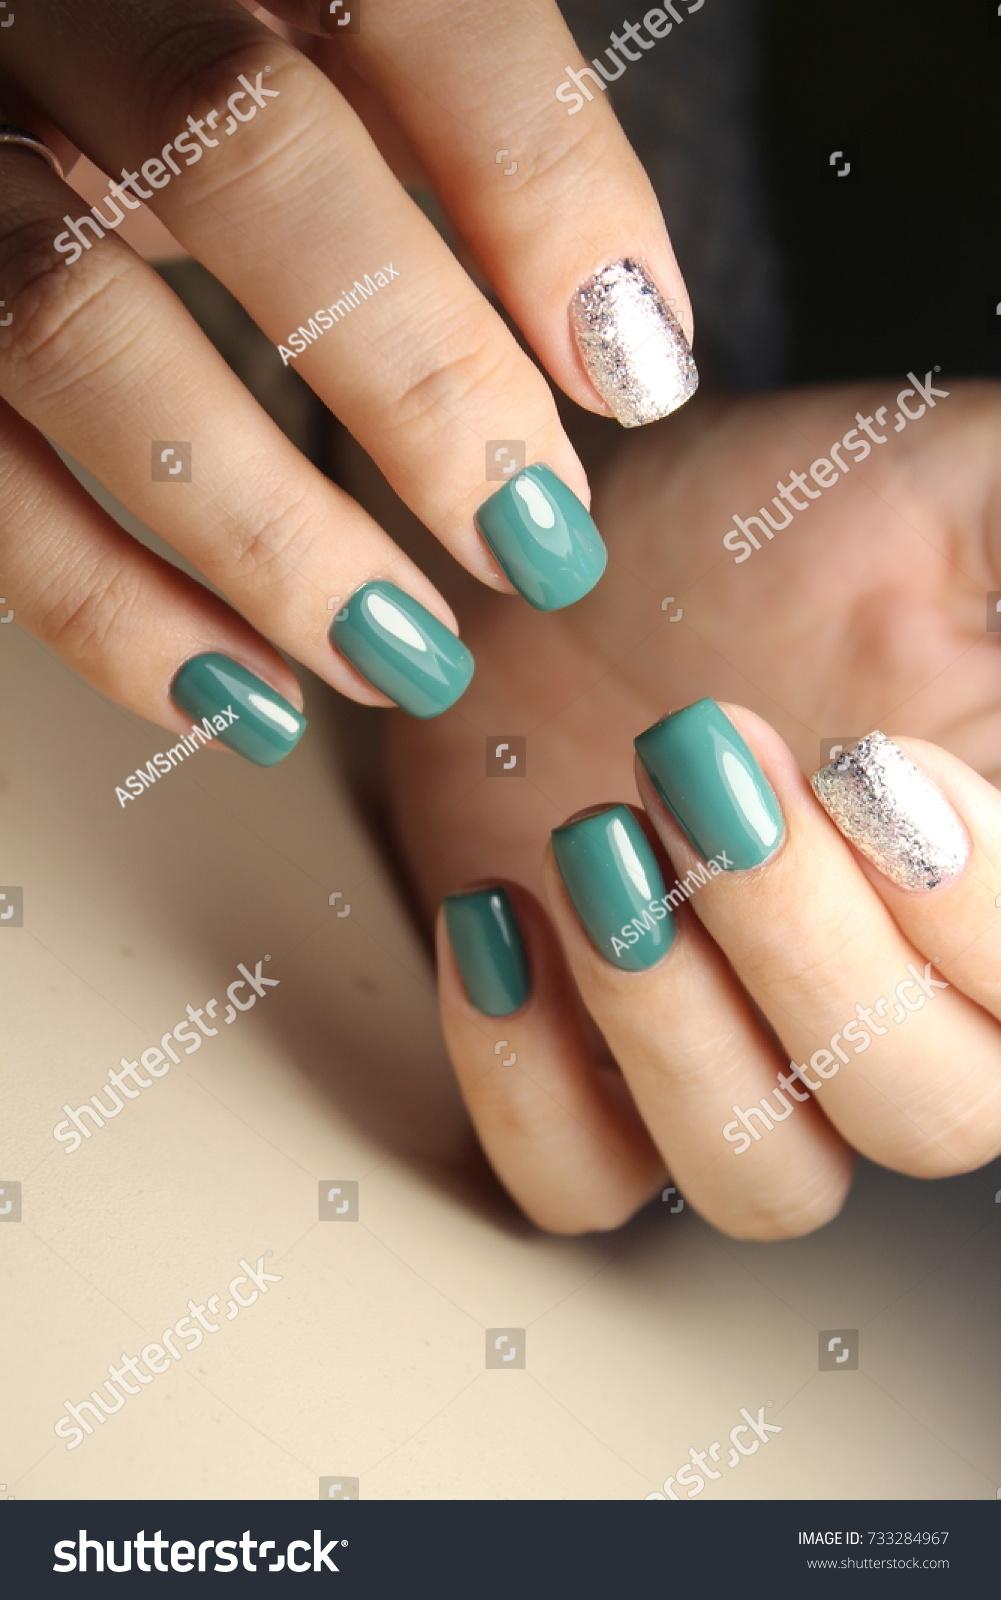 Fashion Nails Design Manicure Best 2017 Stock Photo 733284967 ...